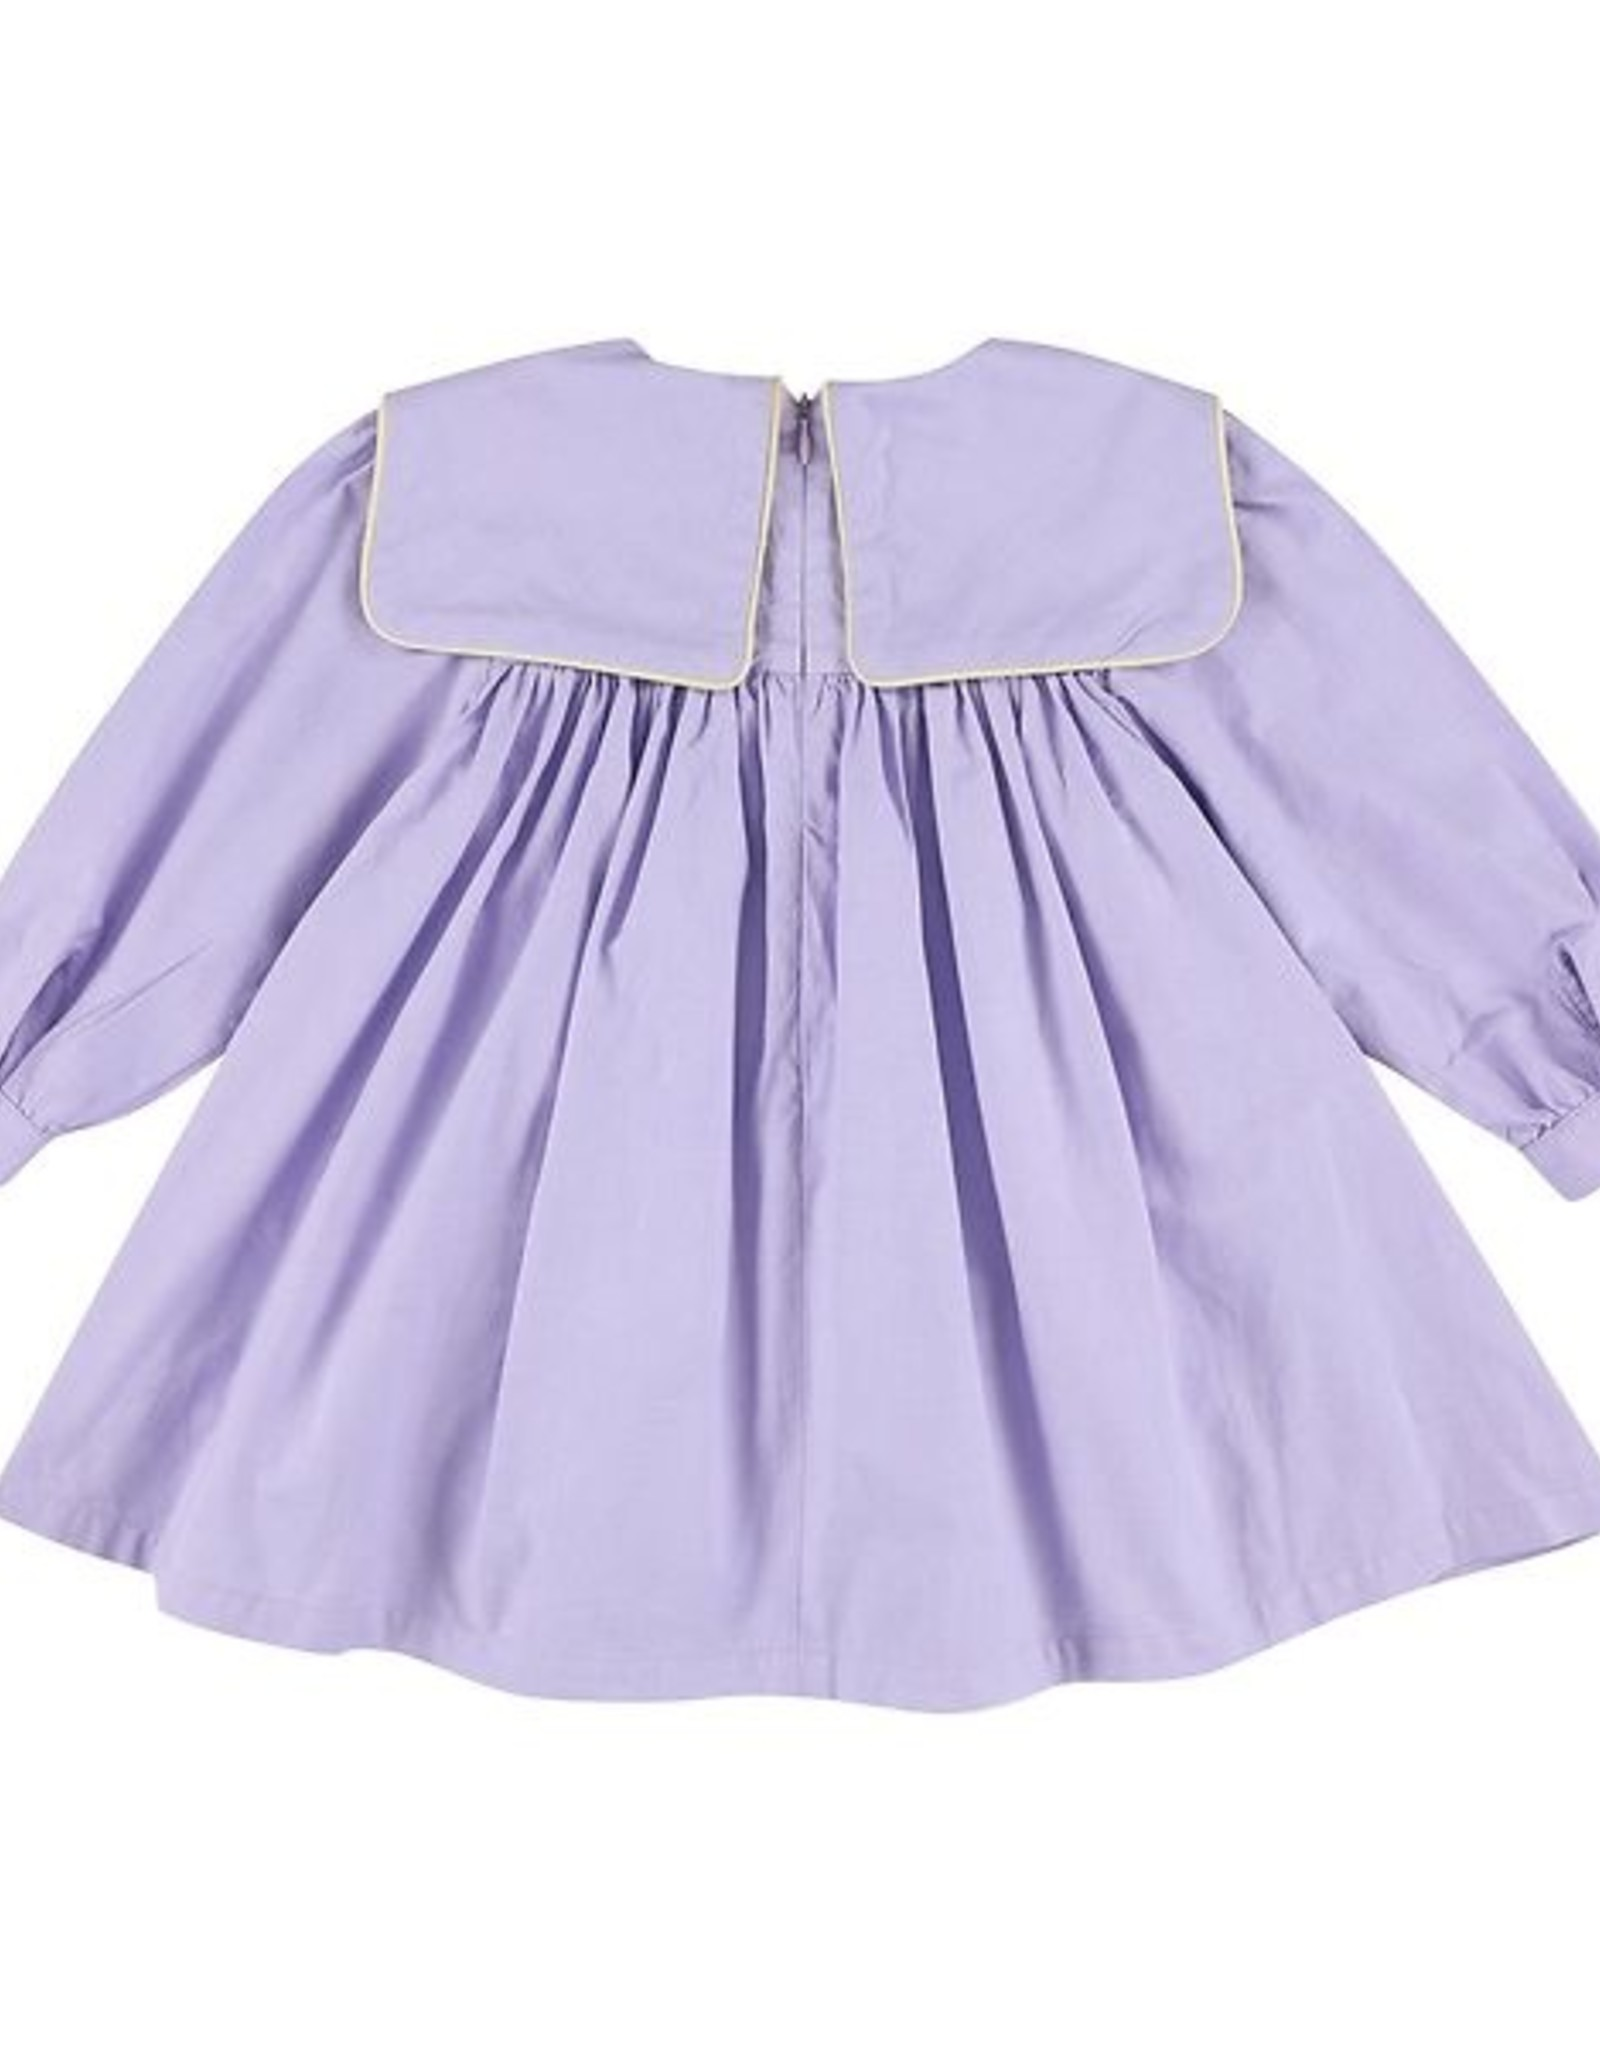 MORLEY MORLEY Oxo amadeus polly dress